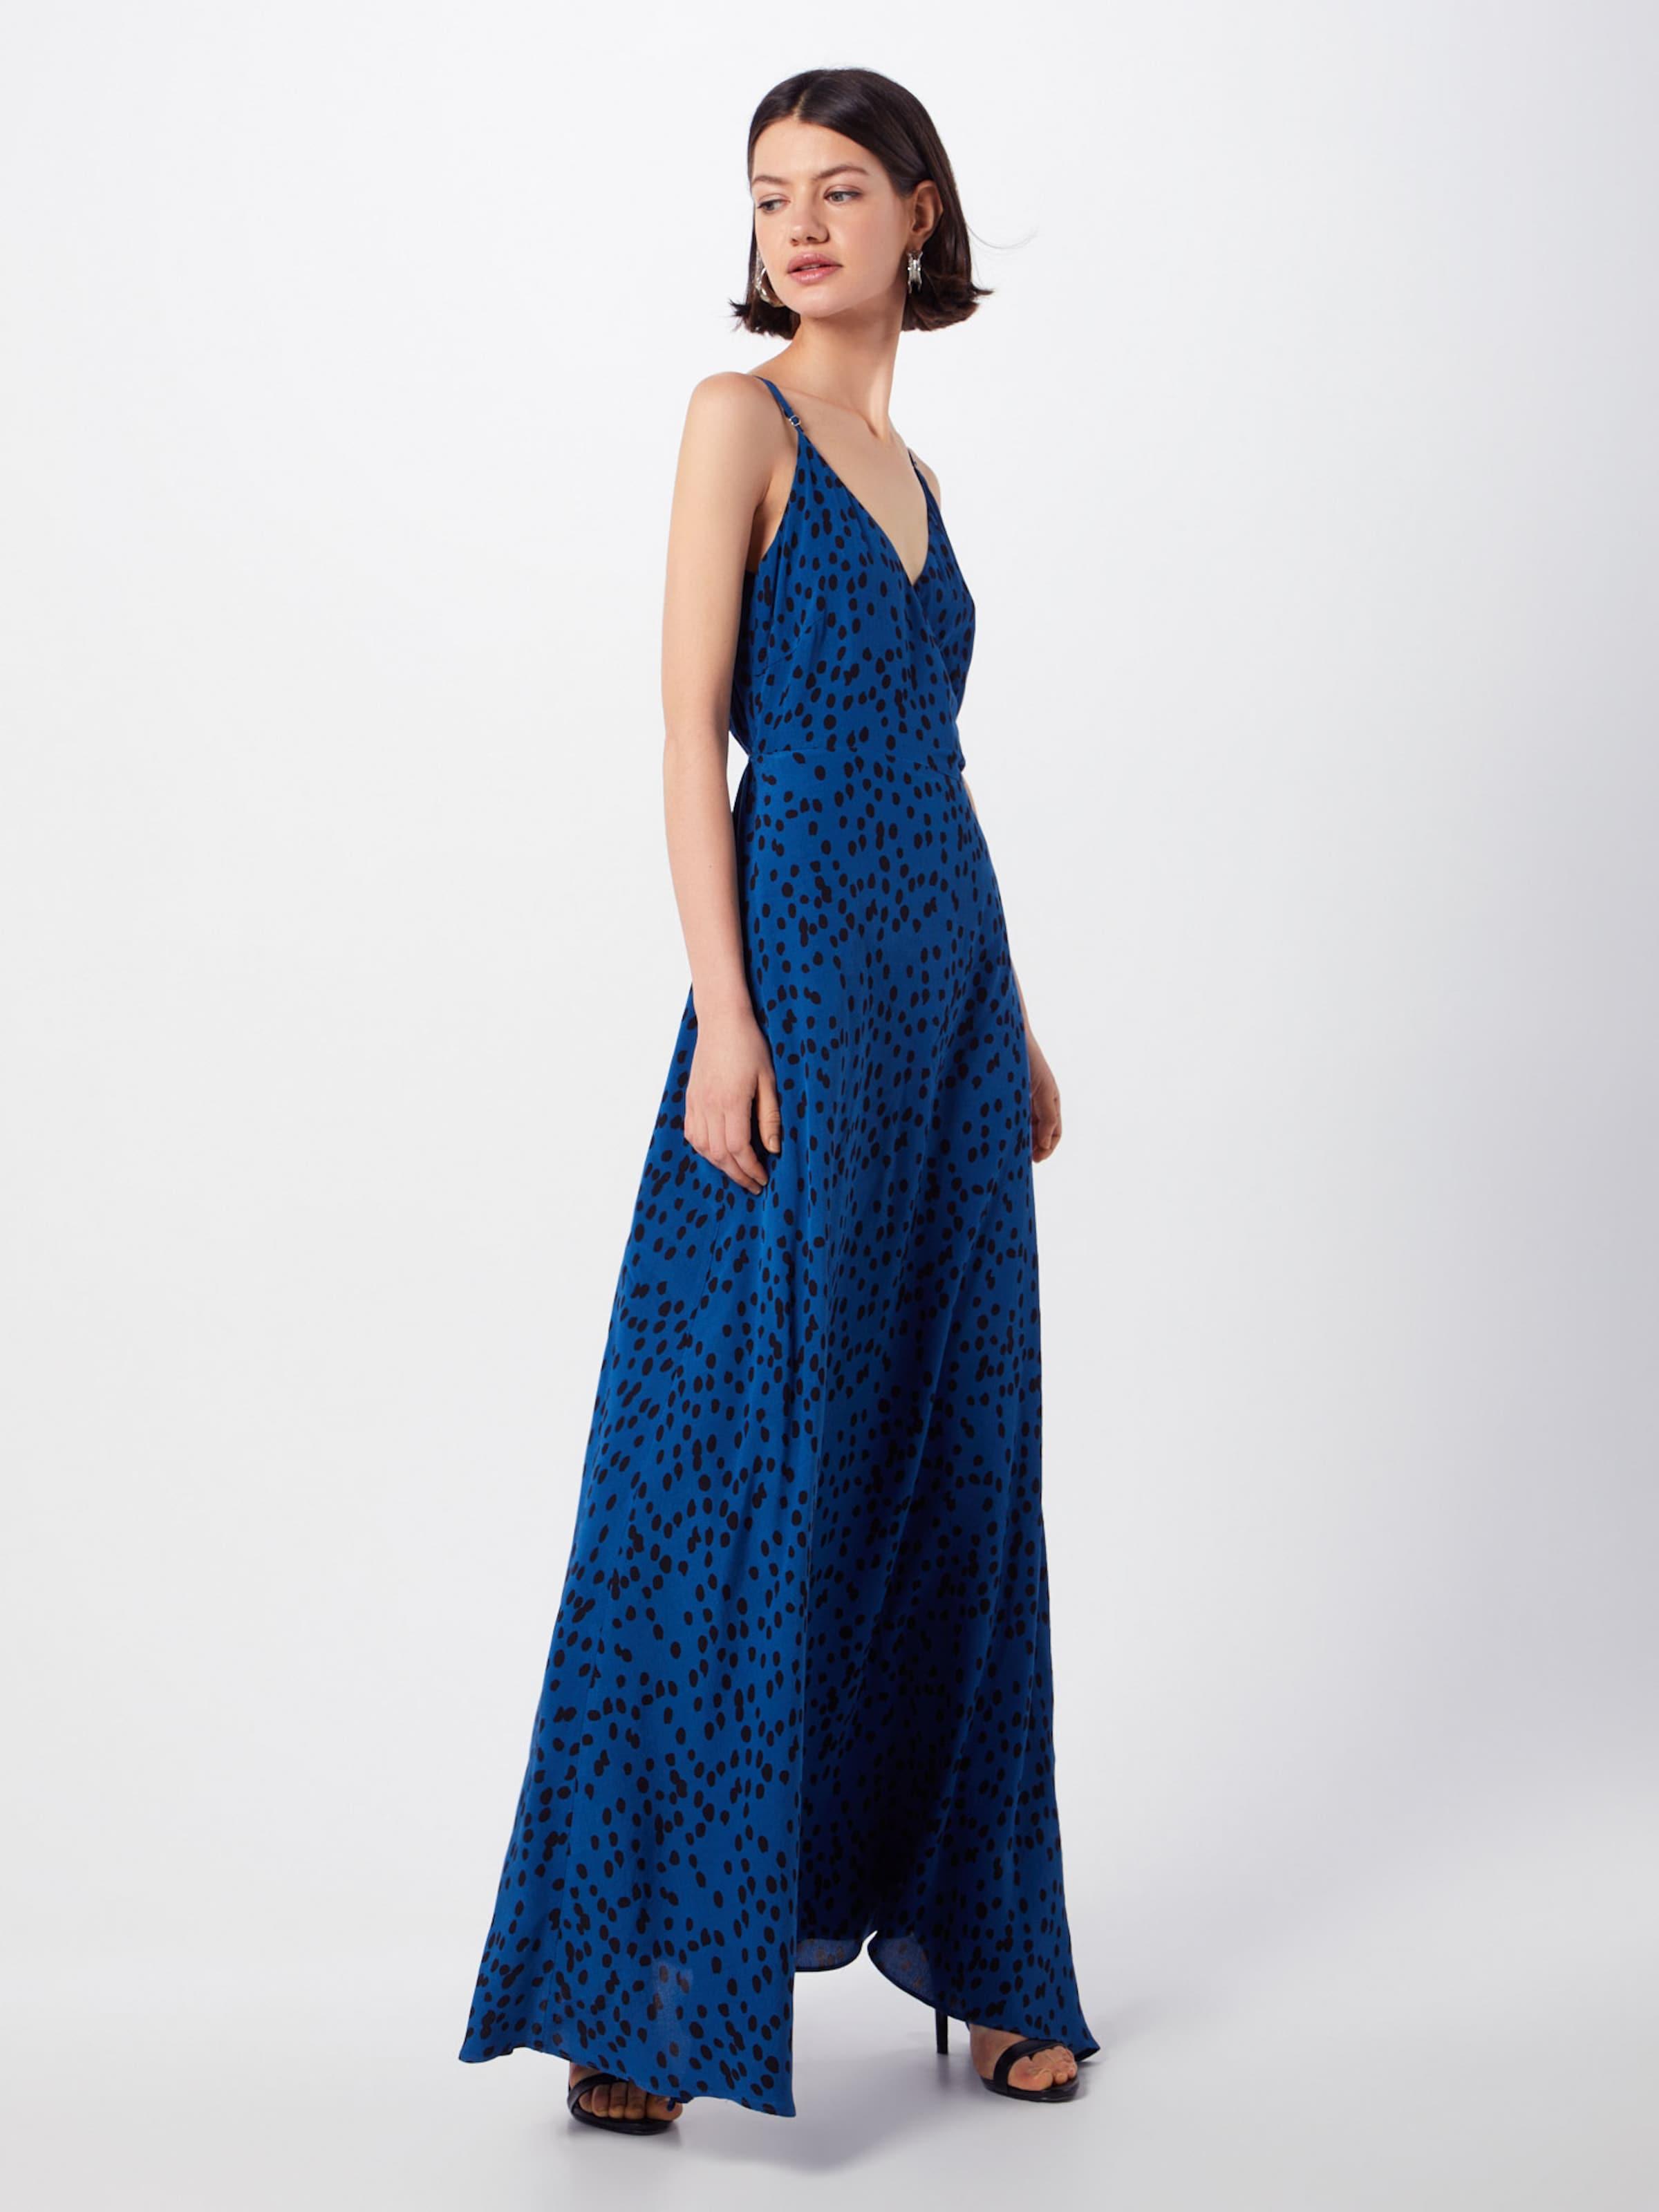 Mbym En Robe Bleu 'beline' Soirée De 54RcASjL3q